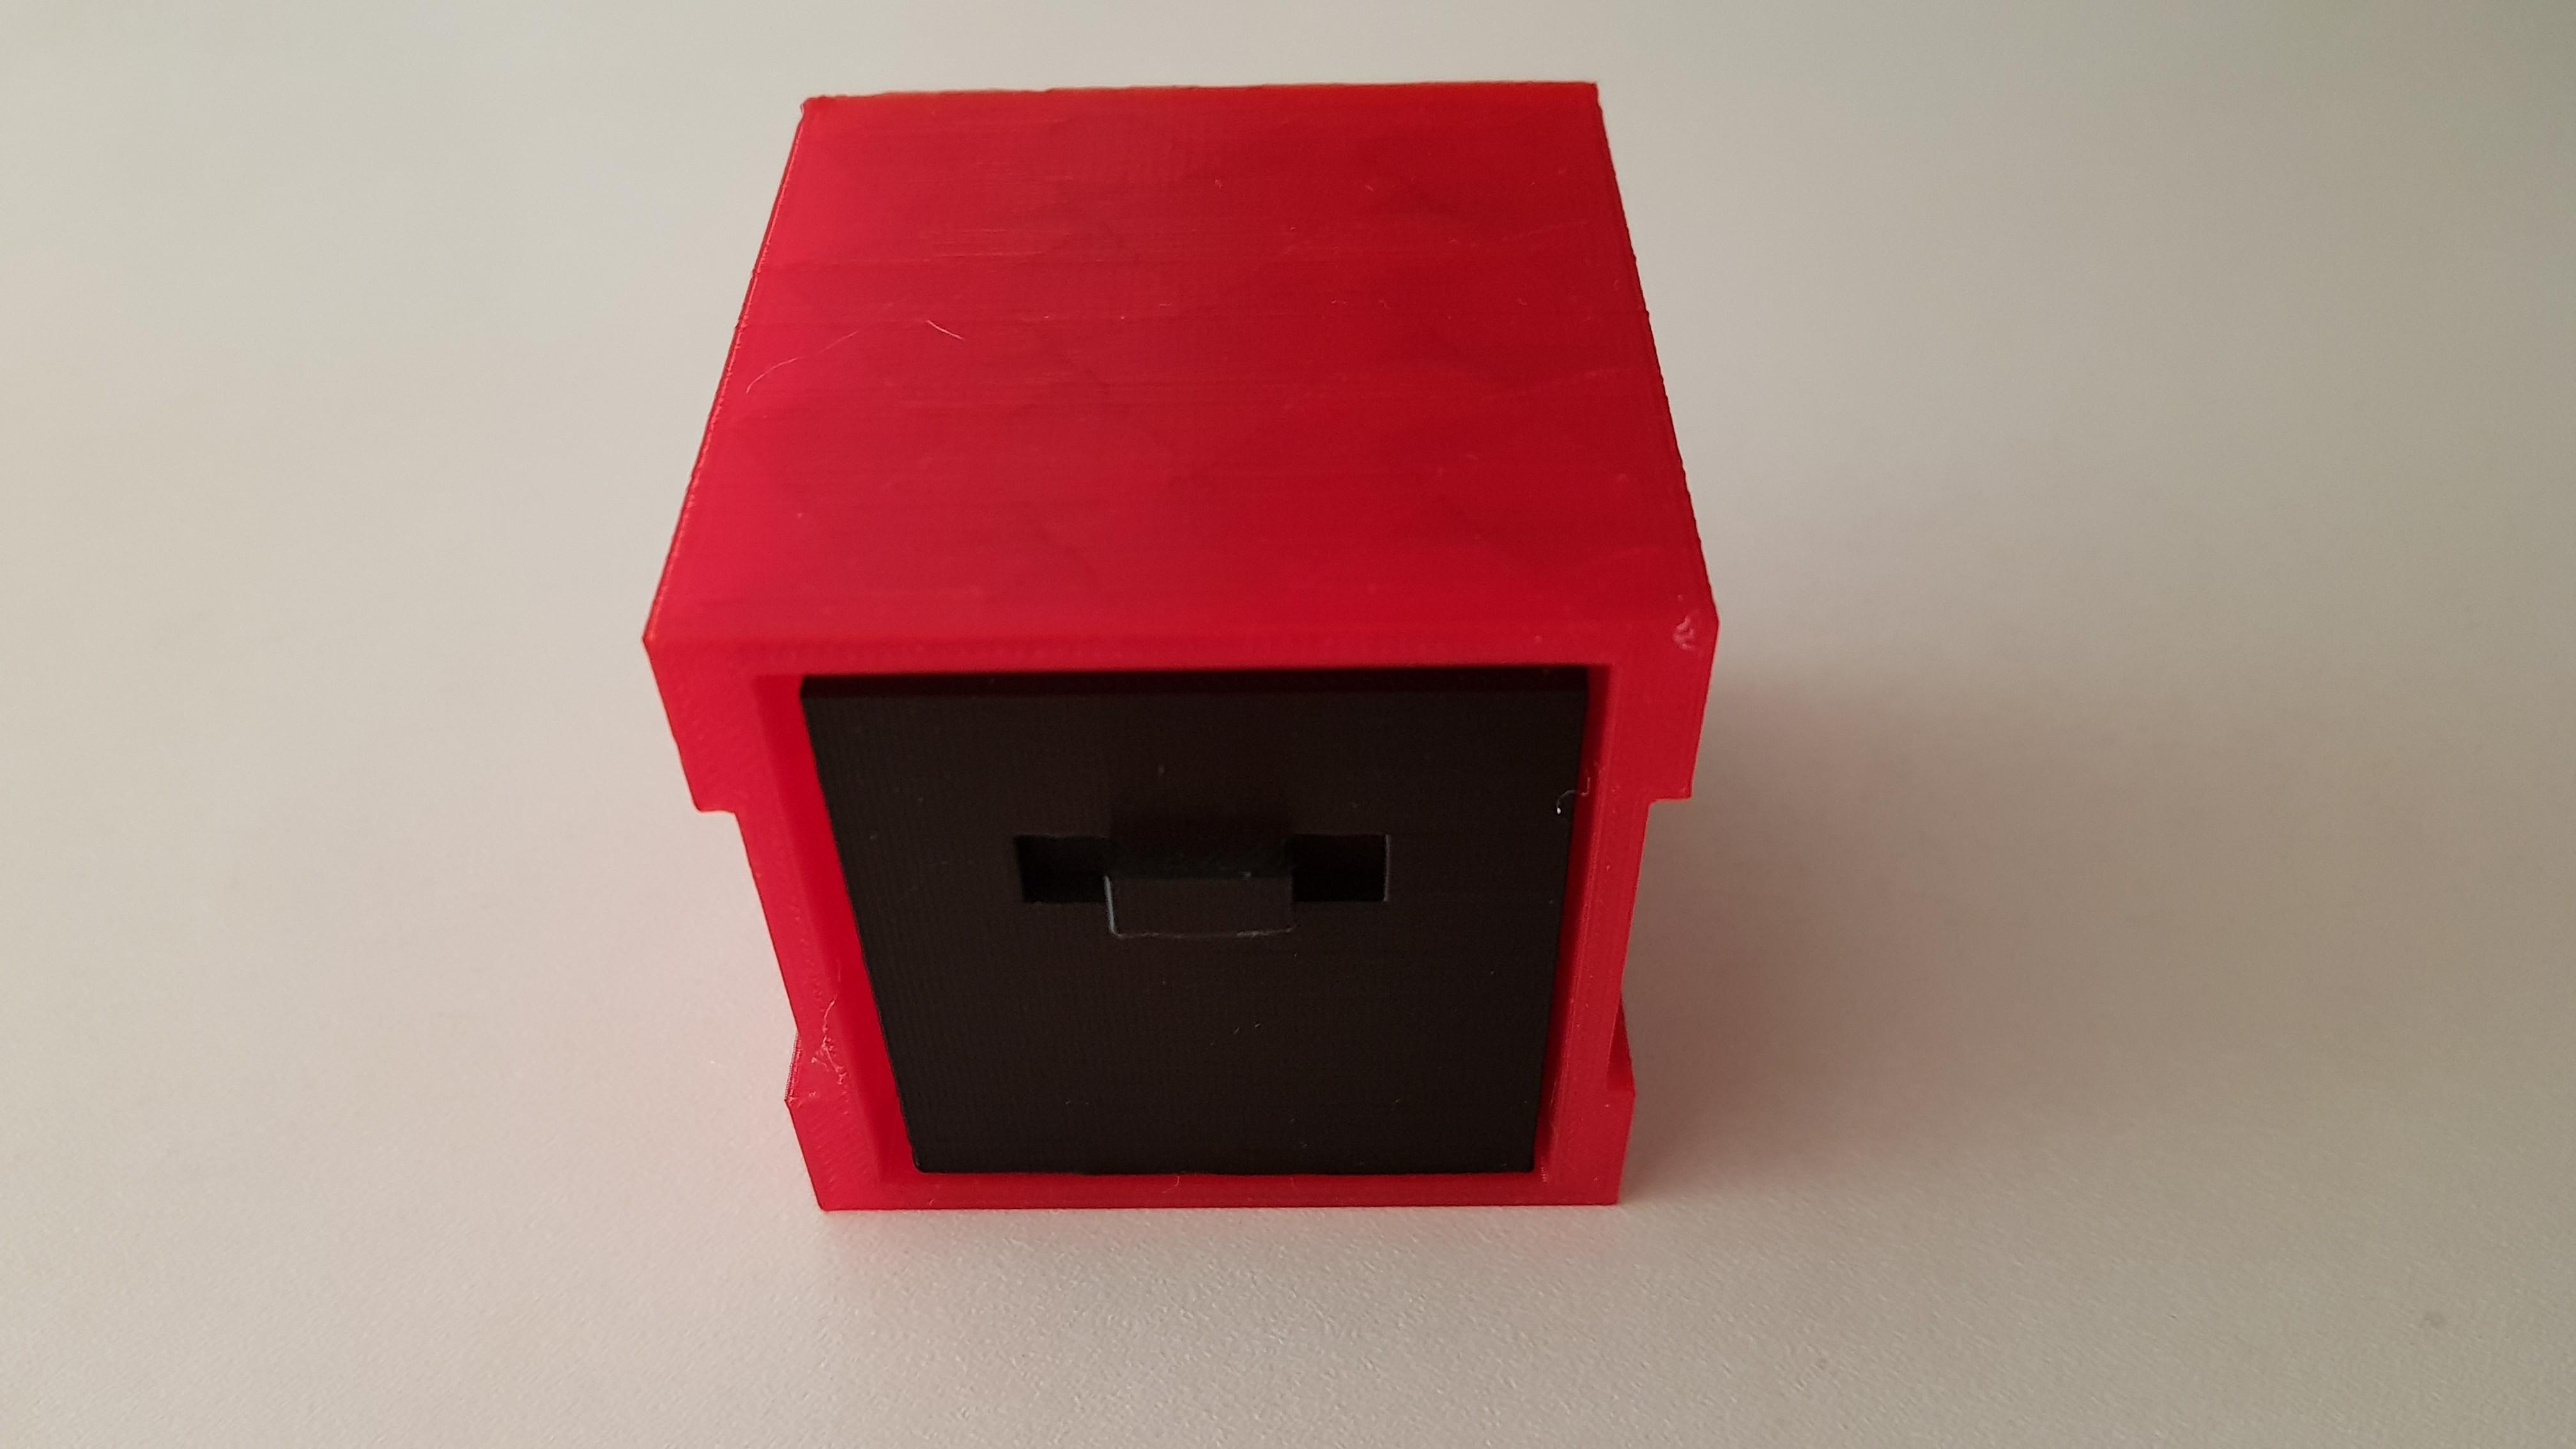 20180218_170130.jpg Download free STL file small box • 3D printable object, solunkejagruti